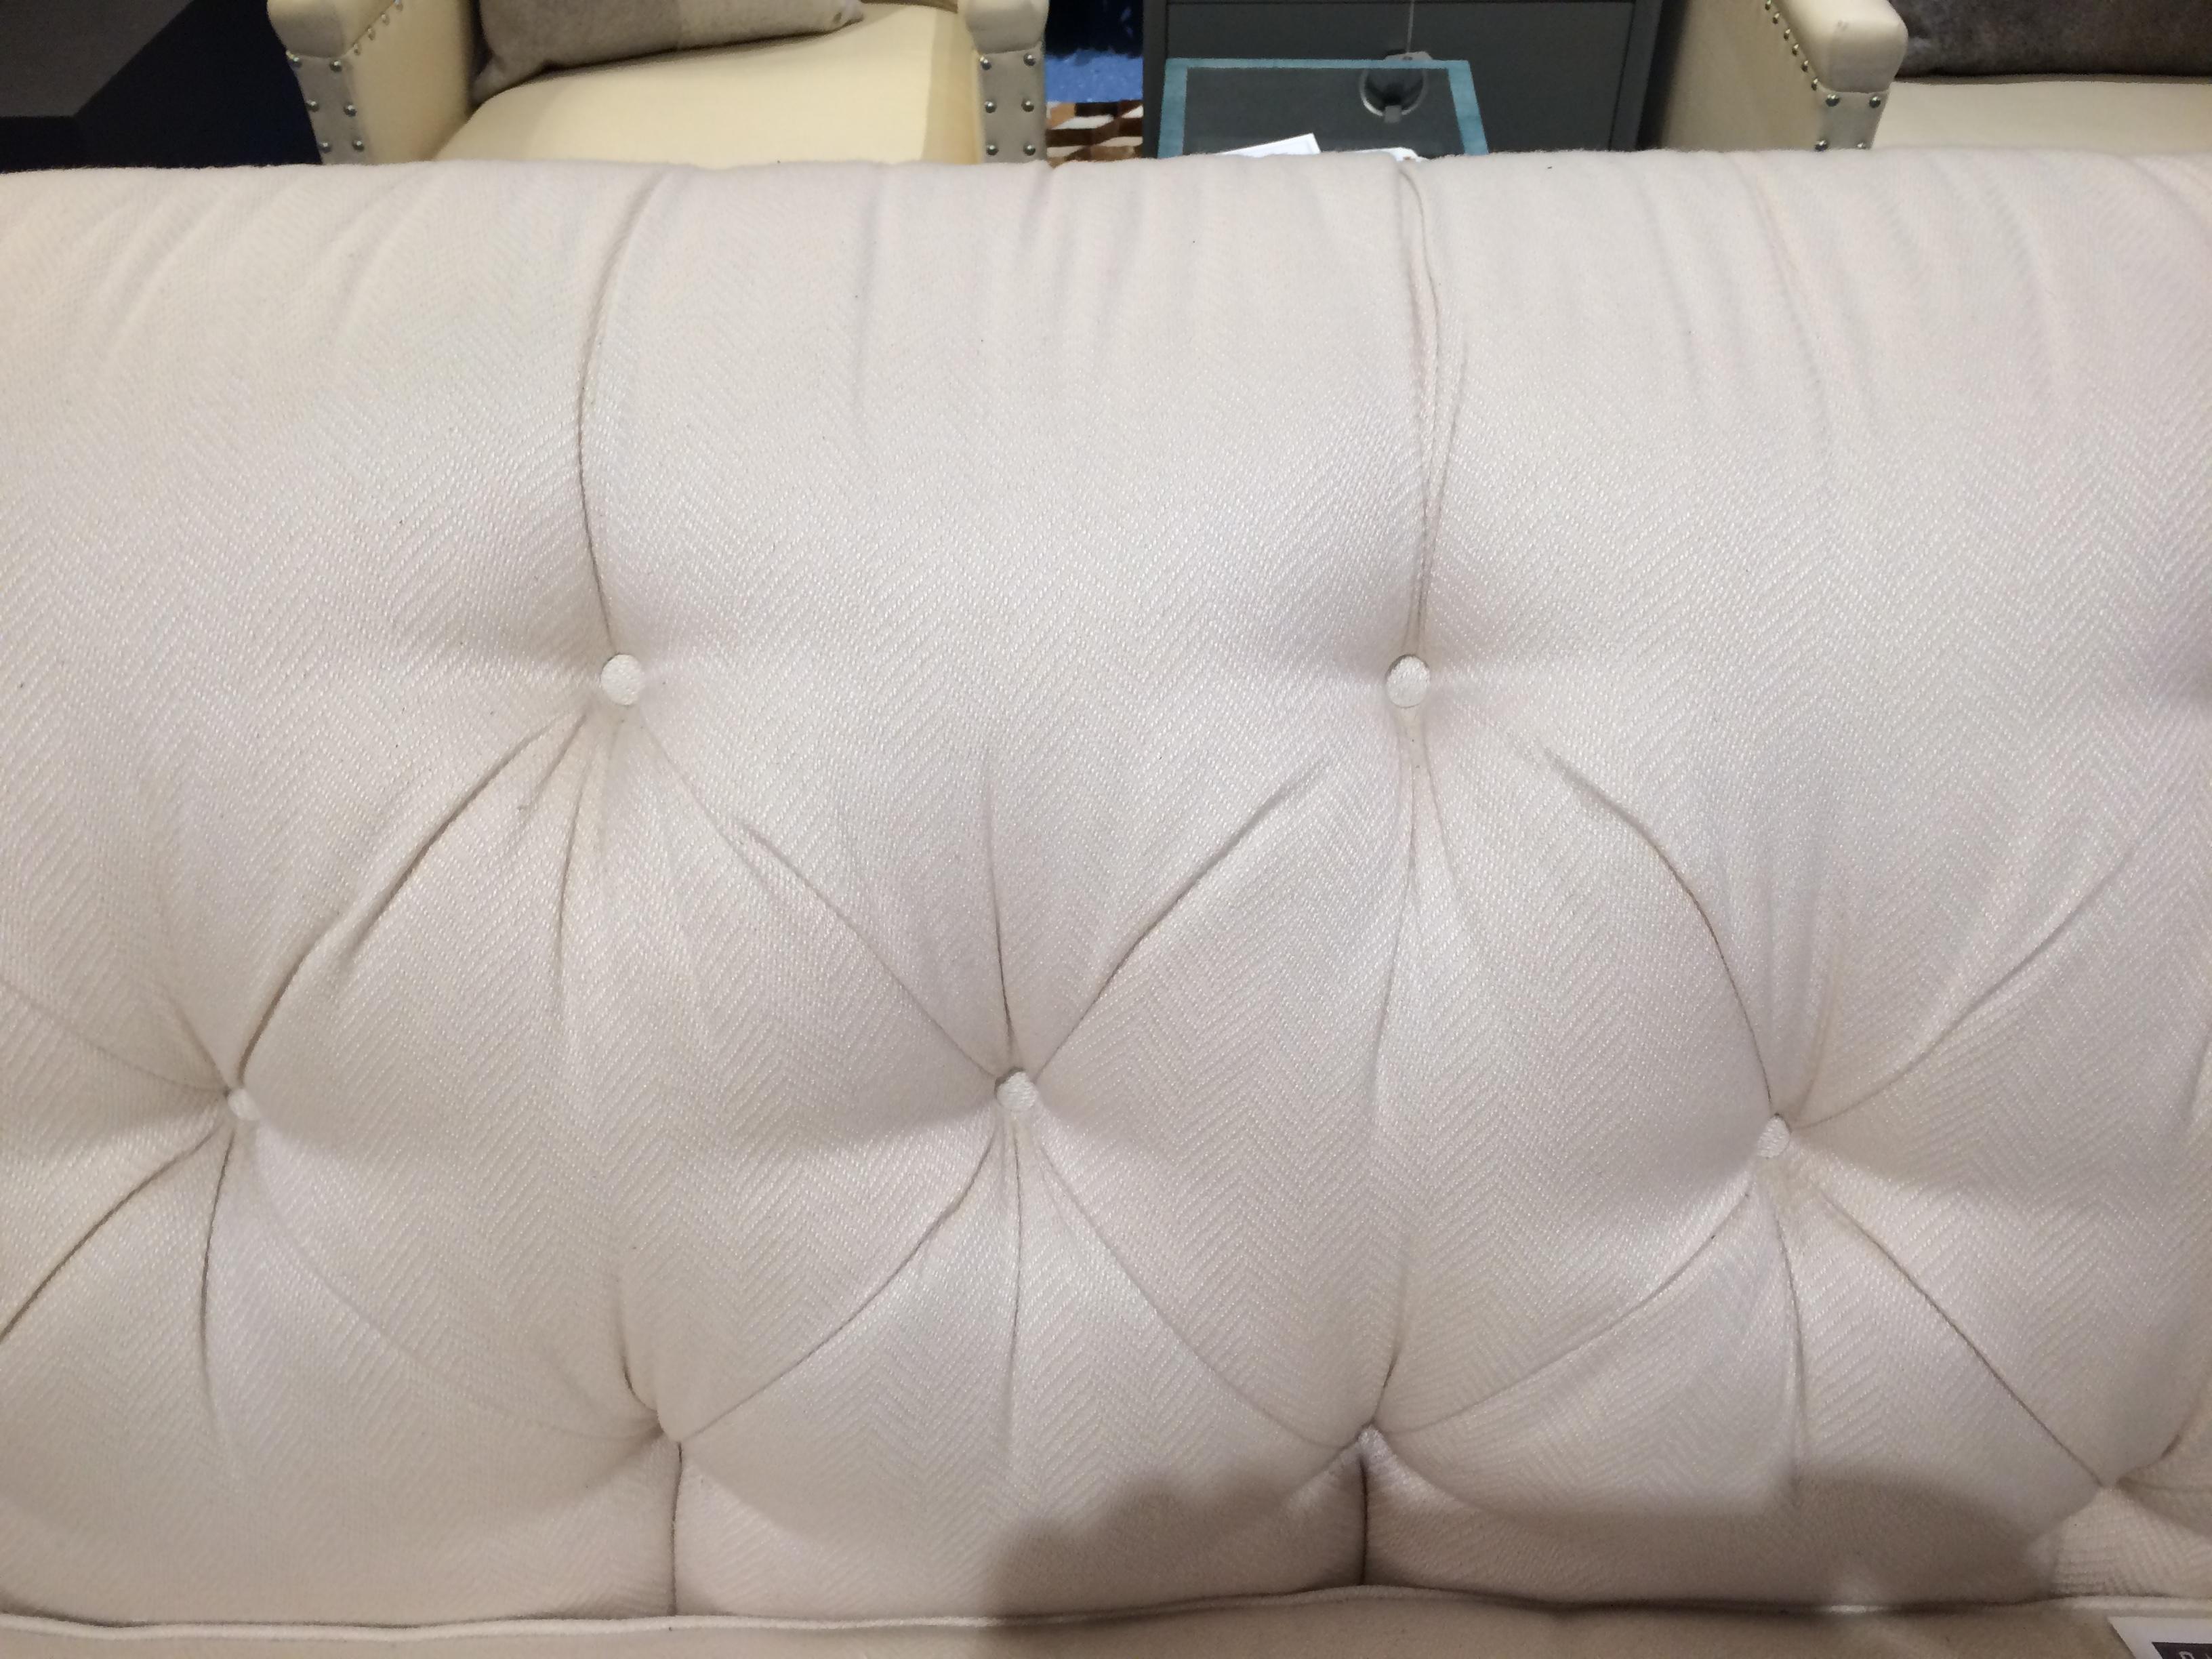 CR Laine Chesterfield Sofa White Sunbrella Fabric   Image 5 Of 11